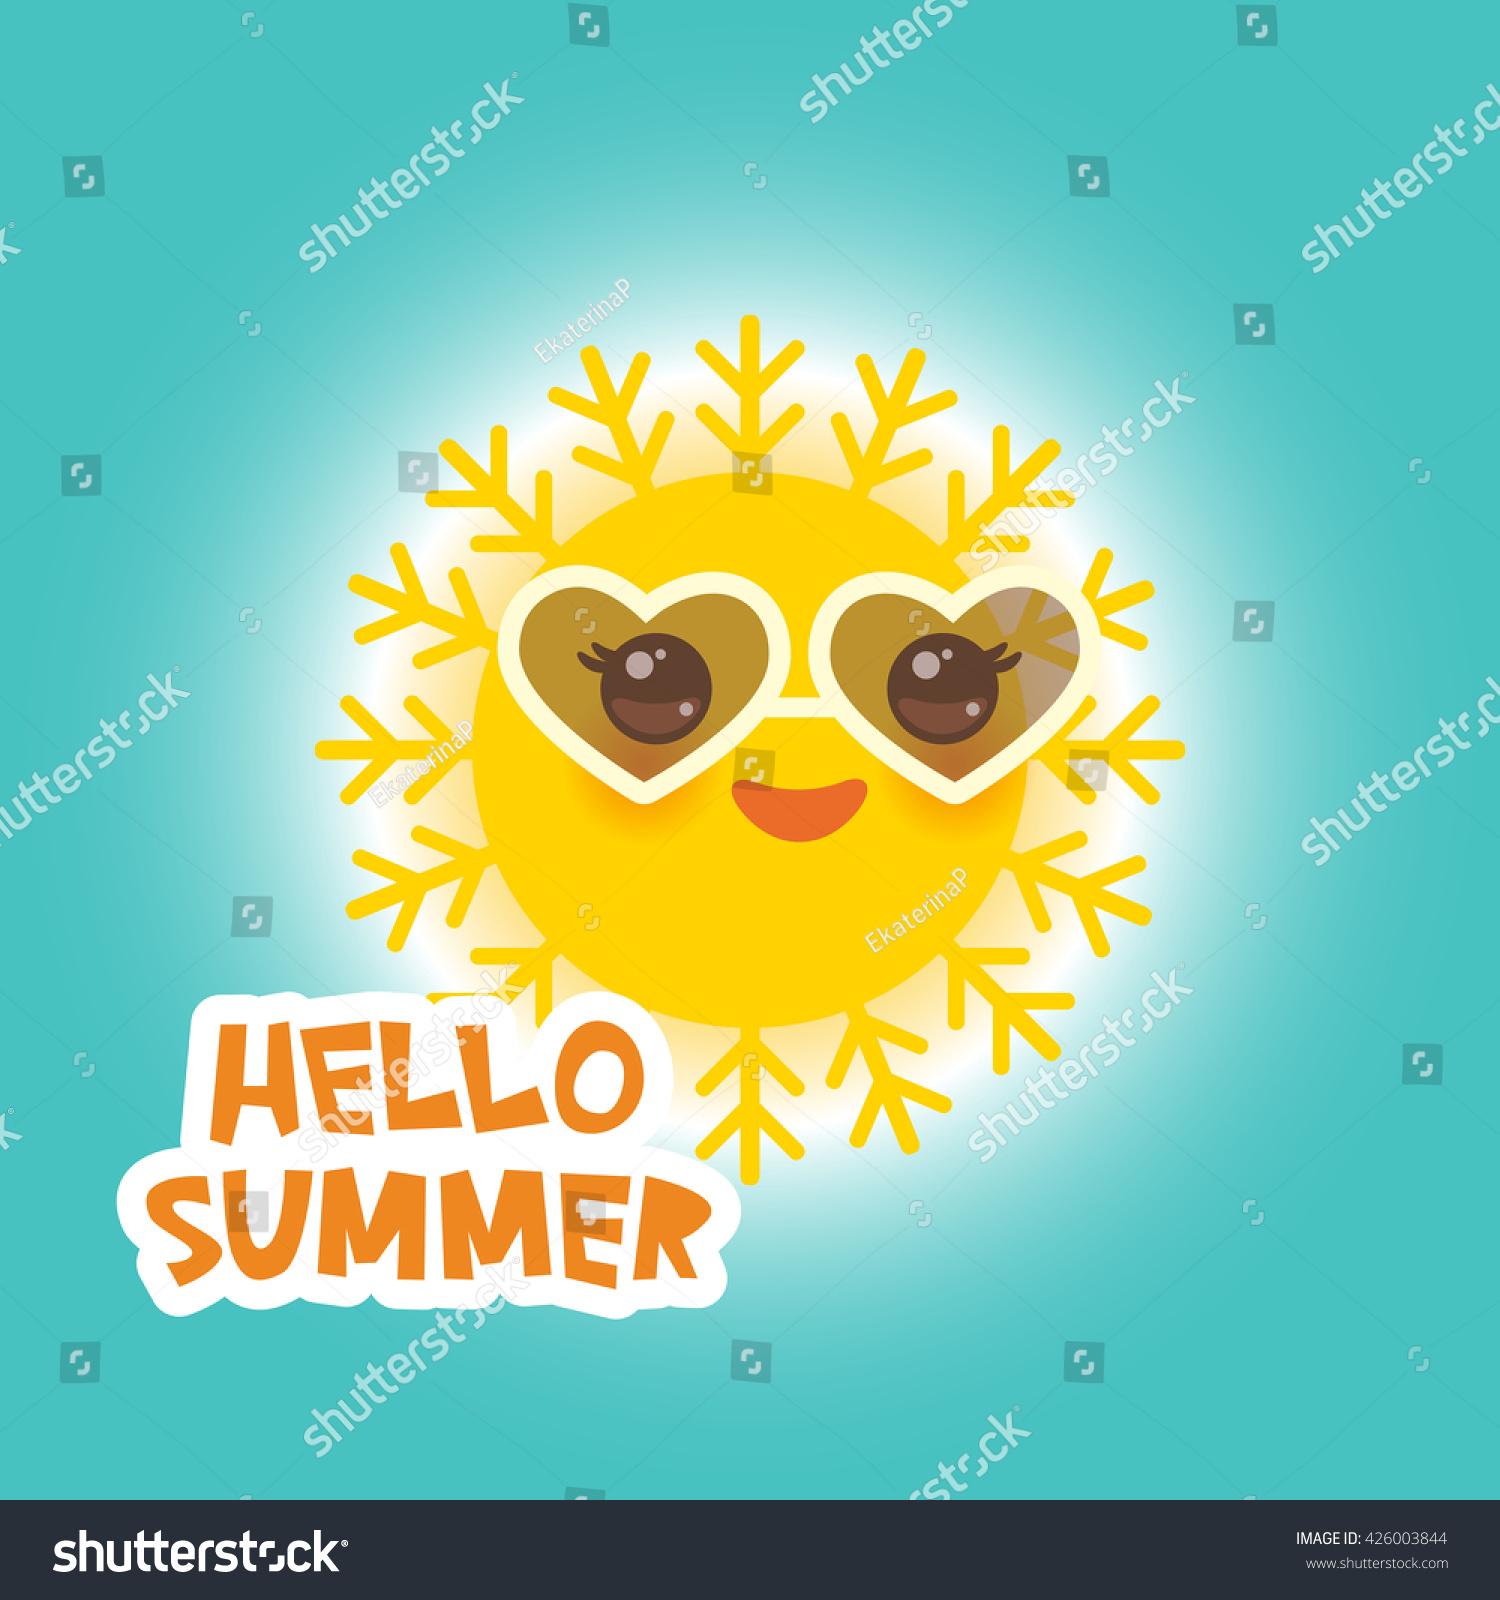 Hello Summer Kawaii Funny Yellow Sun Stock Vector 426003844   Shutterstock